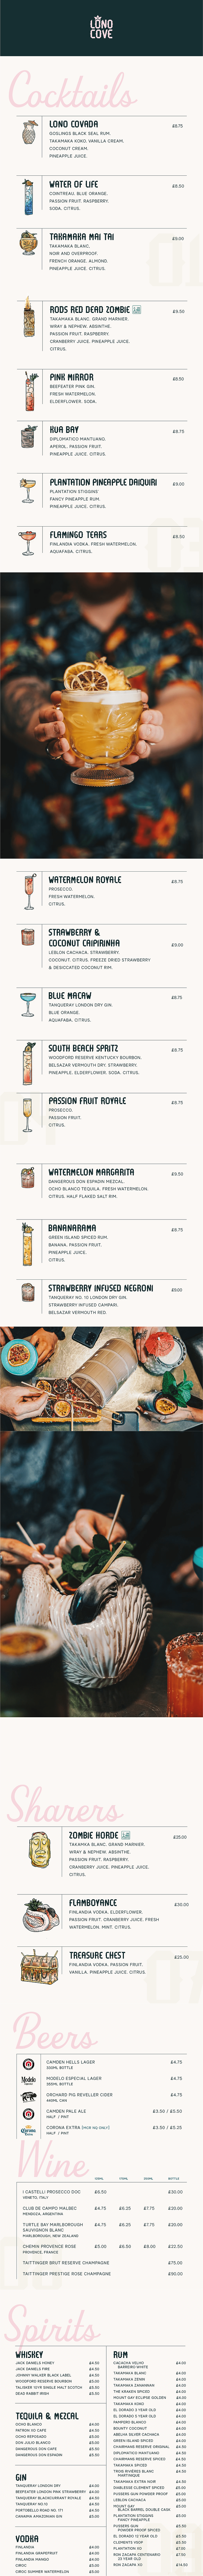 Lono Cove Drinks menu.png